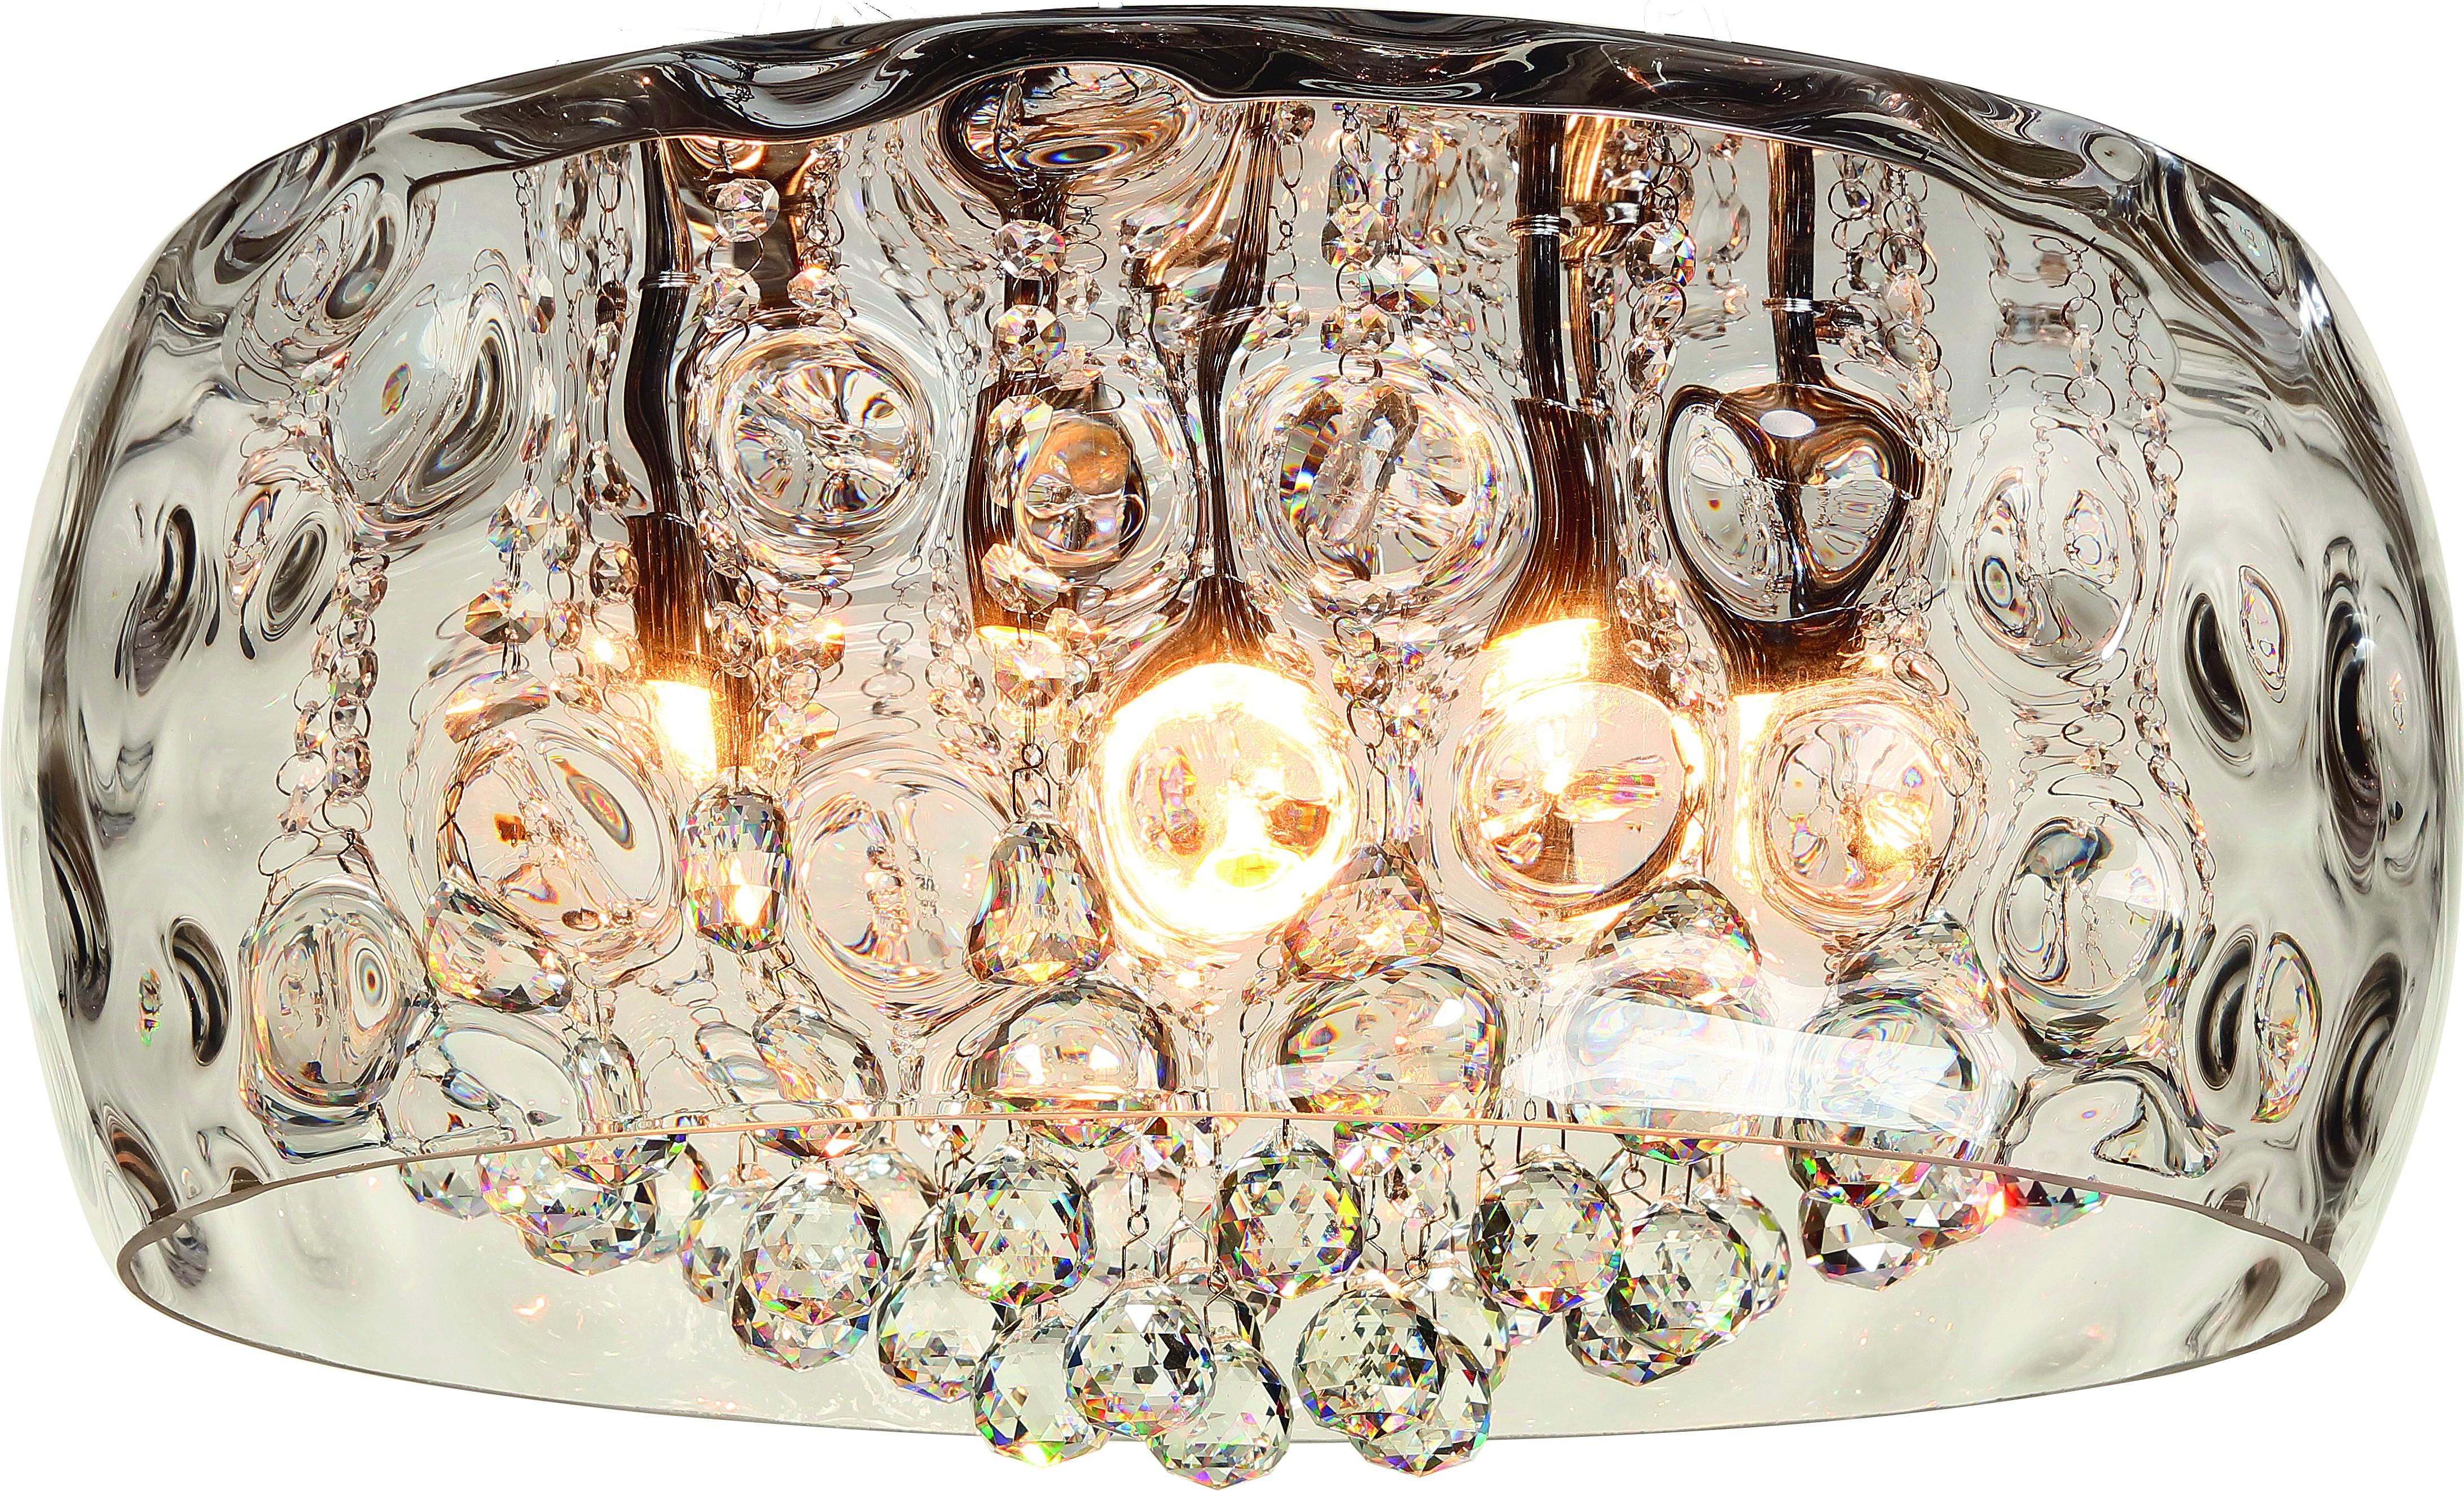 Люстра Arte lamp A8146pl-8cc люстра на штанге arte lamp arancia a9276lm 8cc